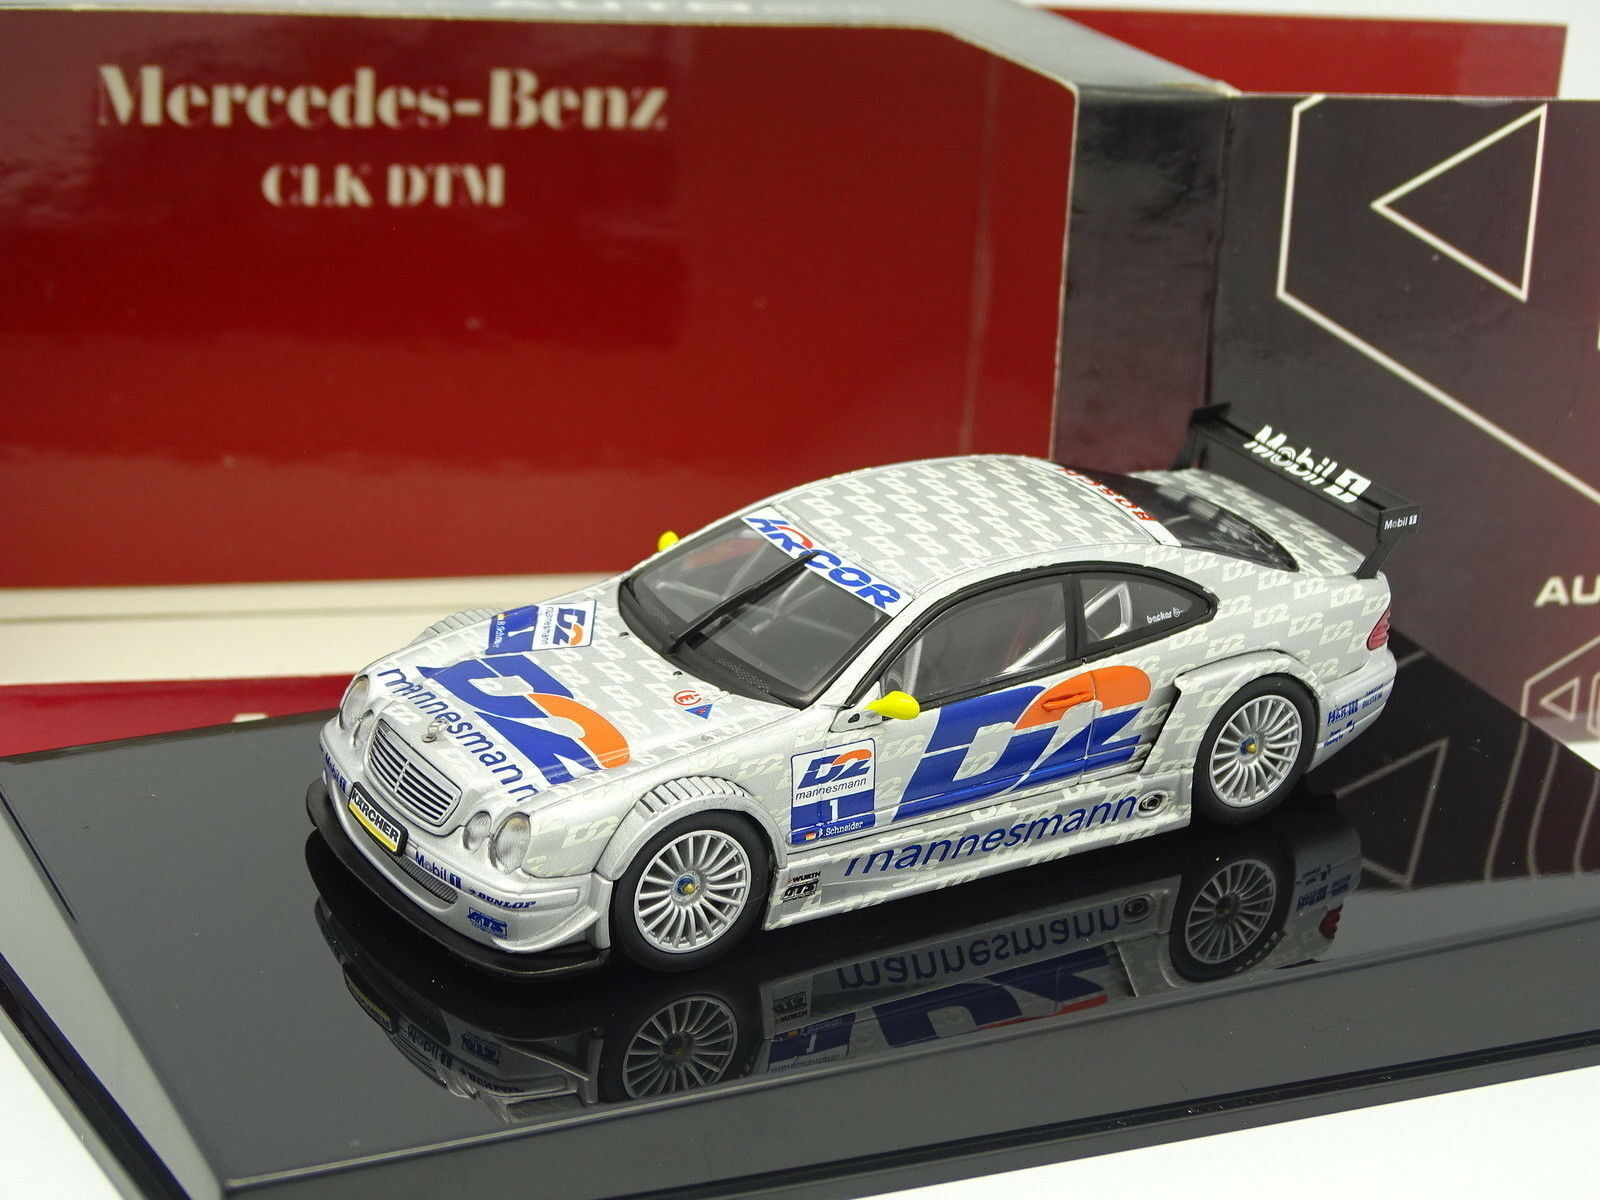 Auto Art 1 43 - Mercedes CLK DTM 2000 Schneider